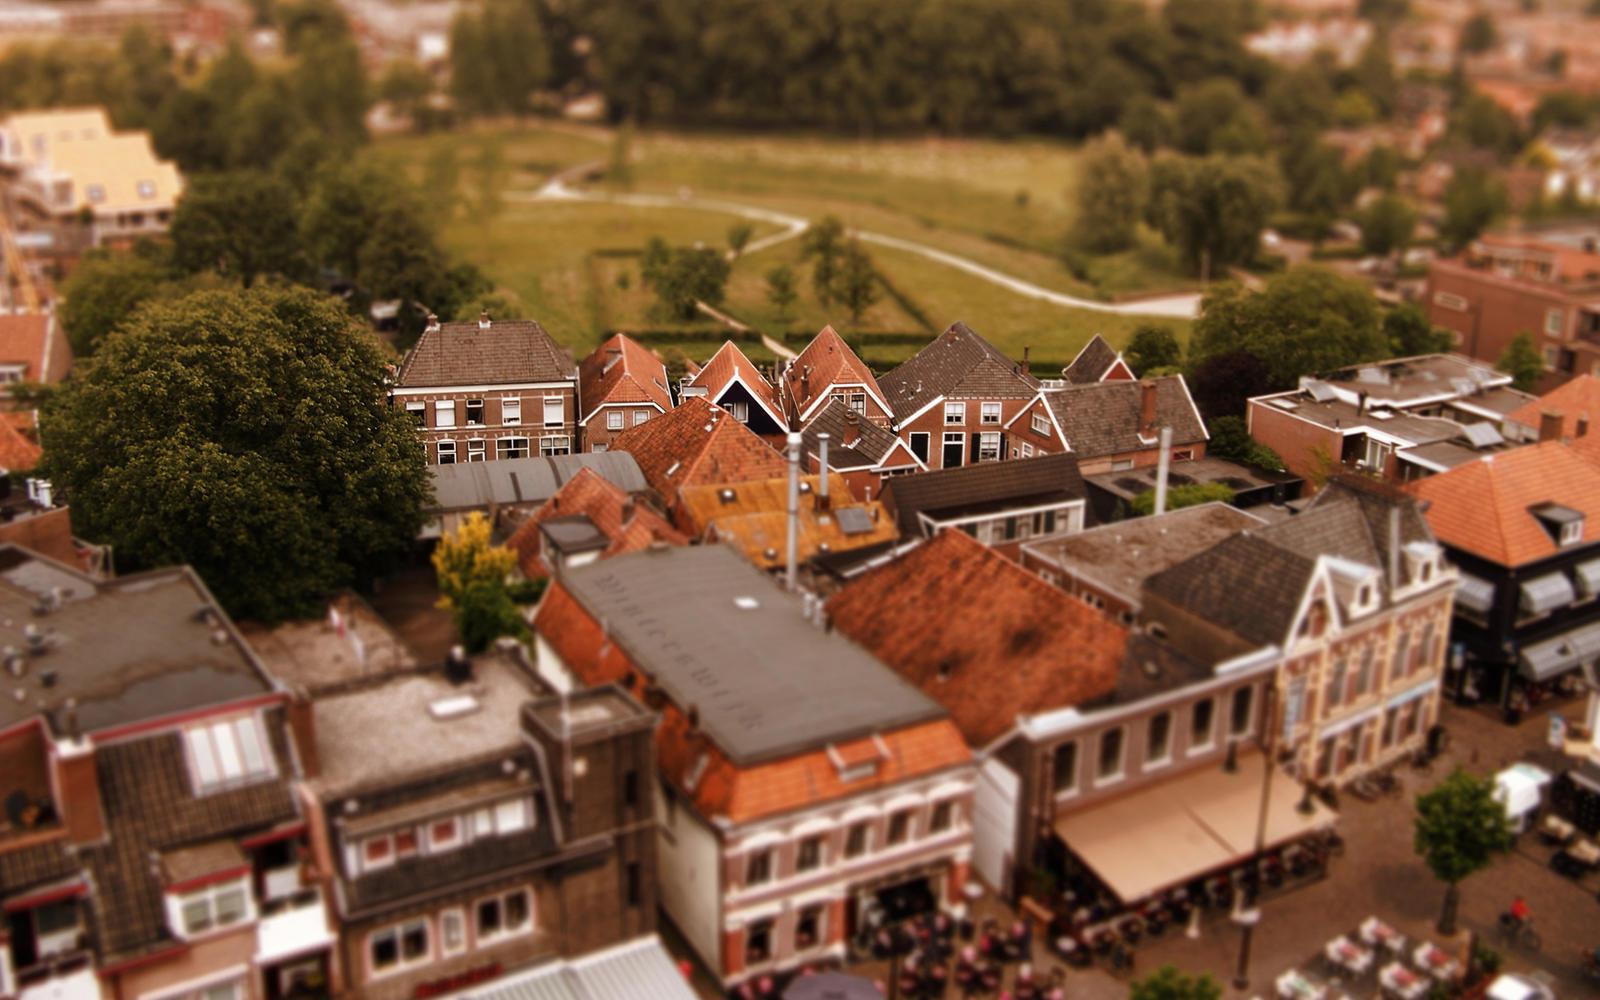 winterswijk chatrooms Photo upload photo change location amsterdam - nl login.